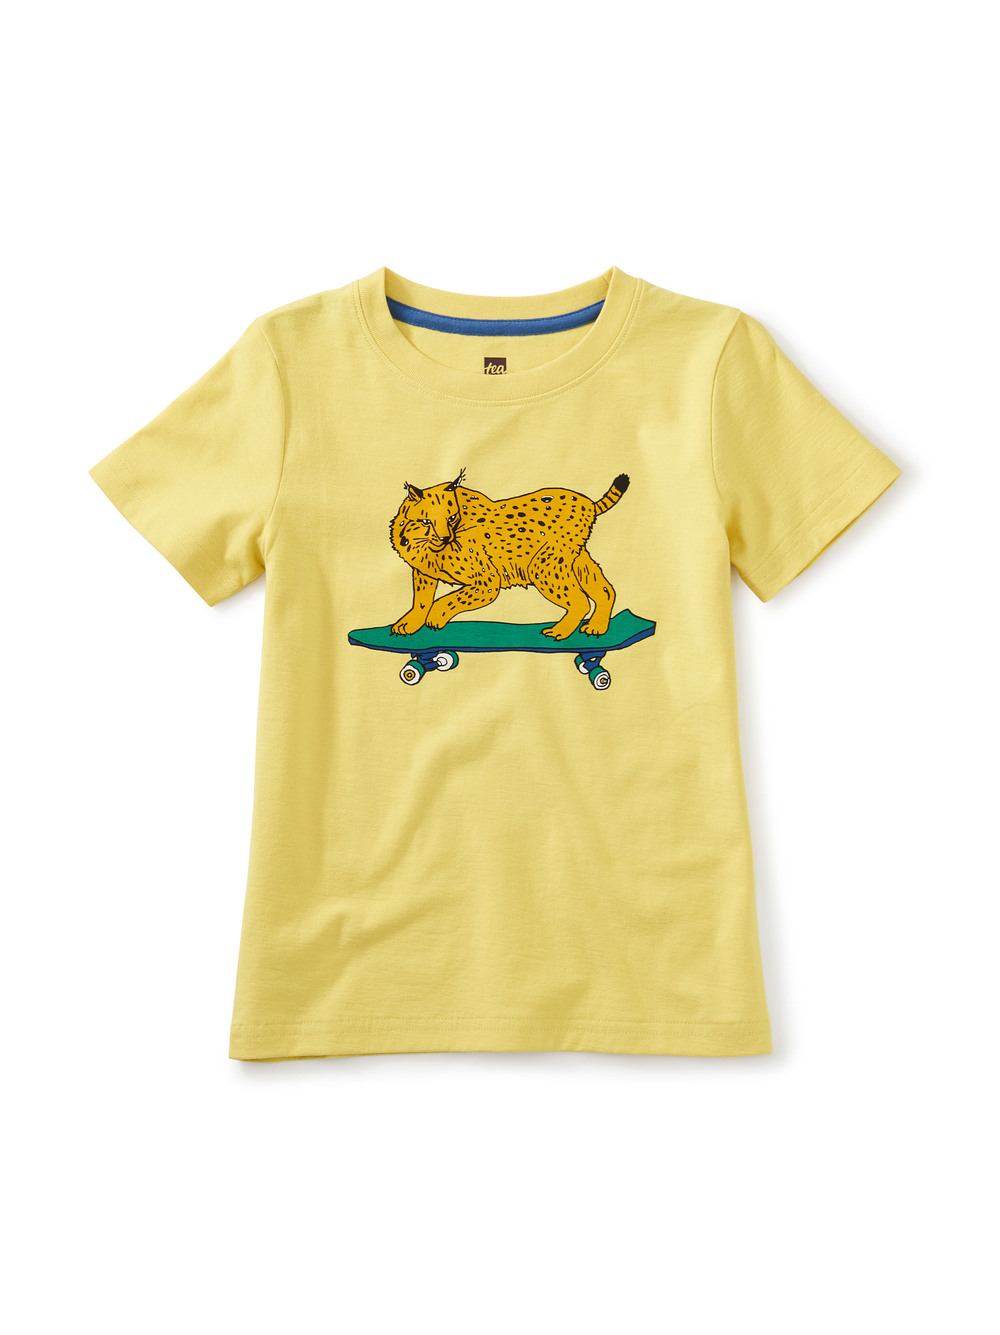 Skate Lynx Graphic Tee